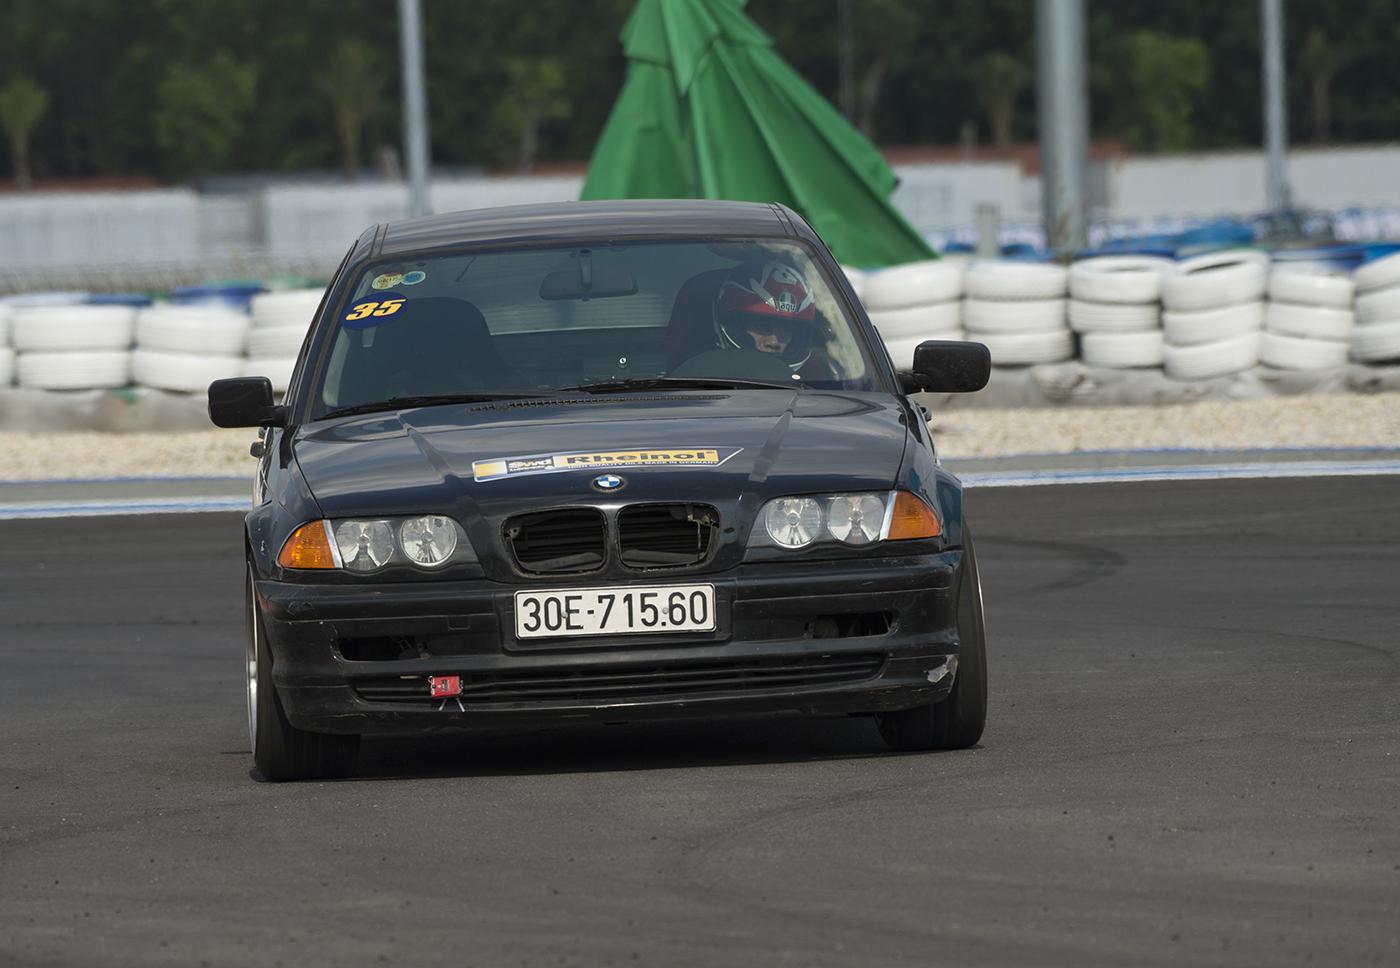 rheinol-racing-days-autodaily-0-49.jpg